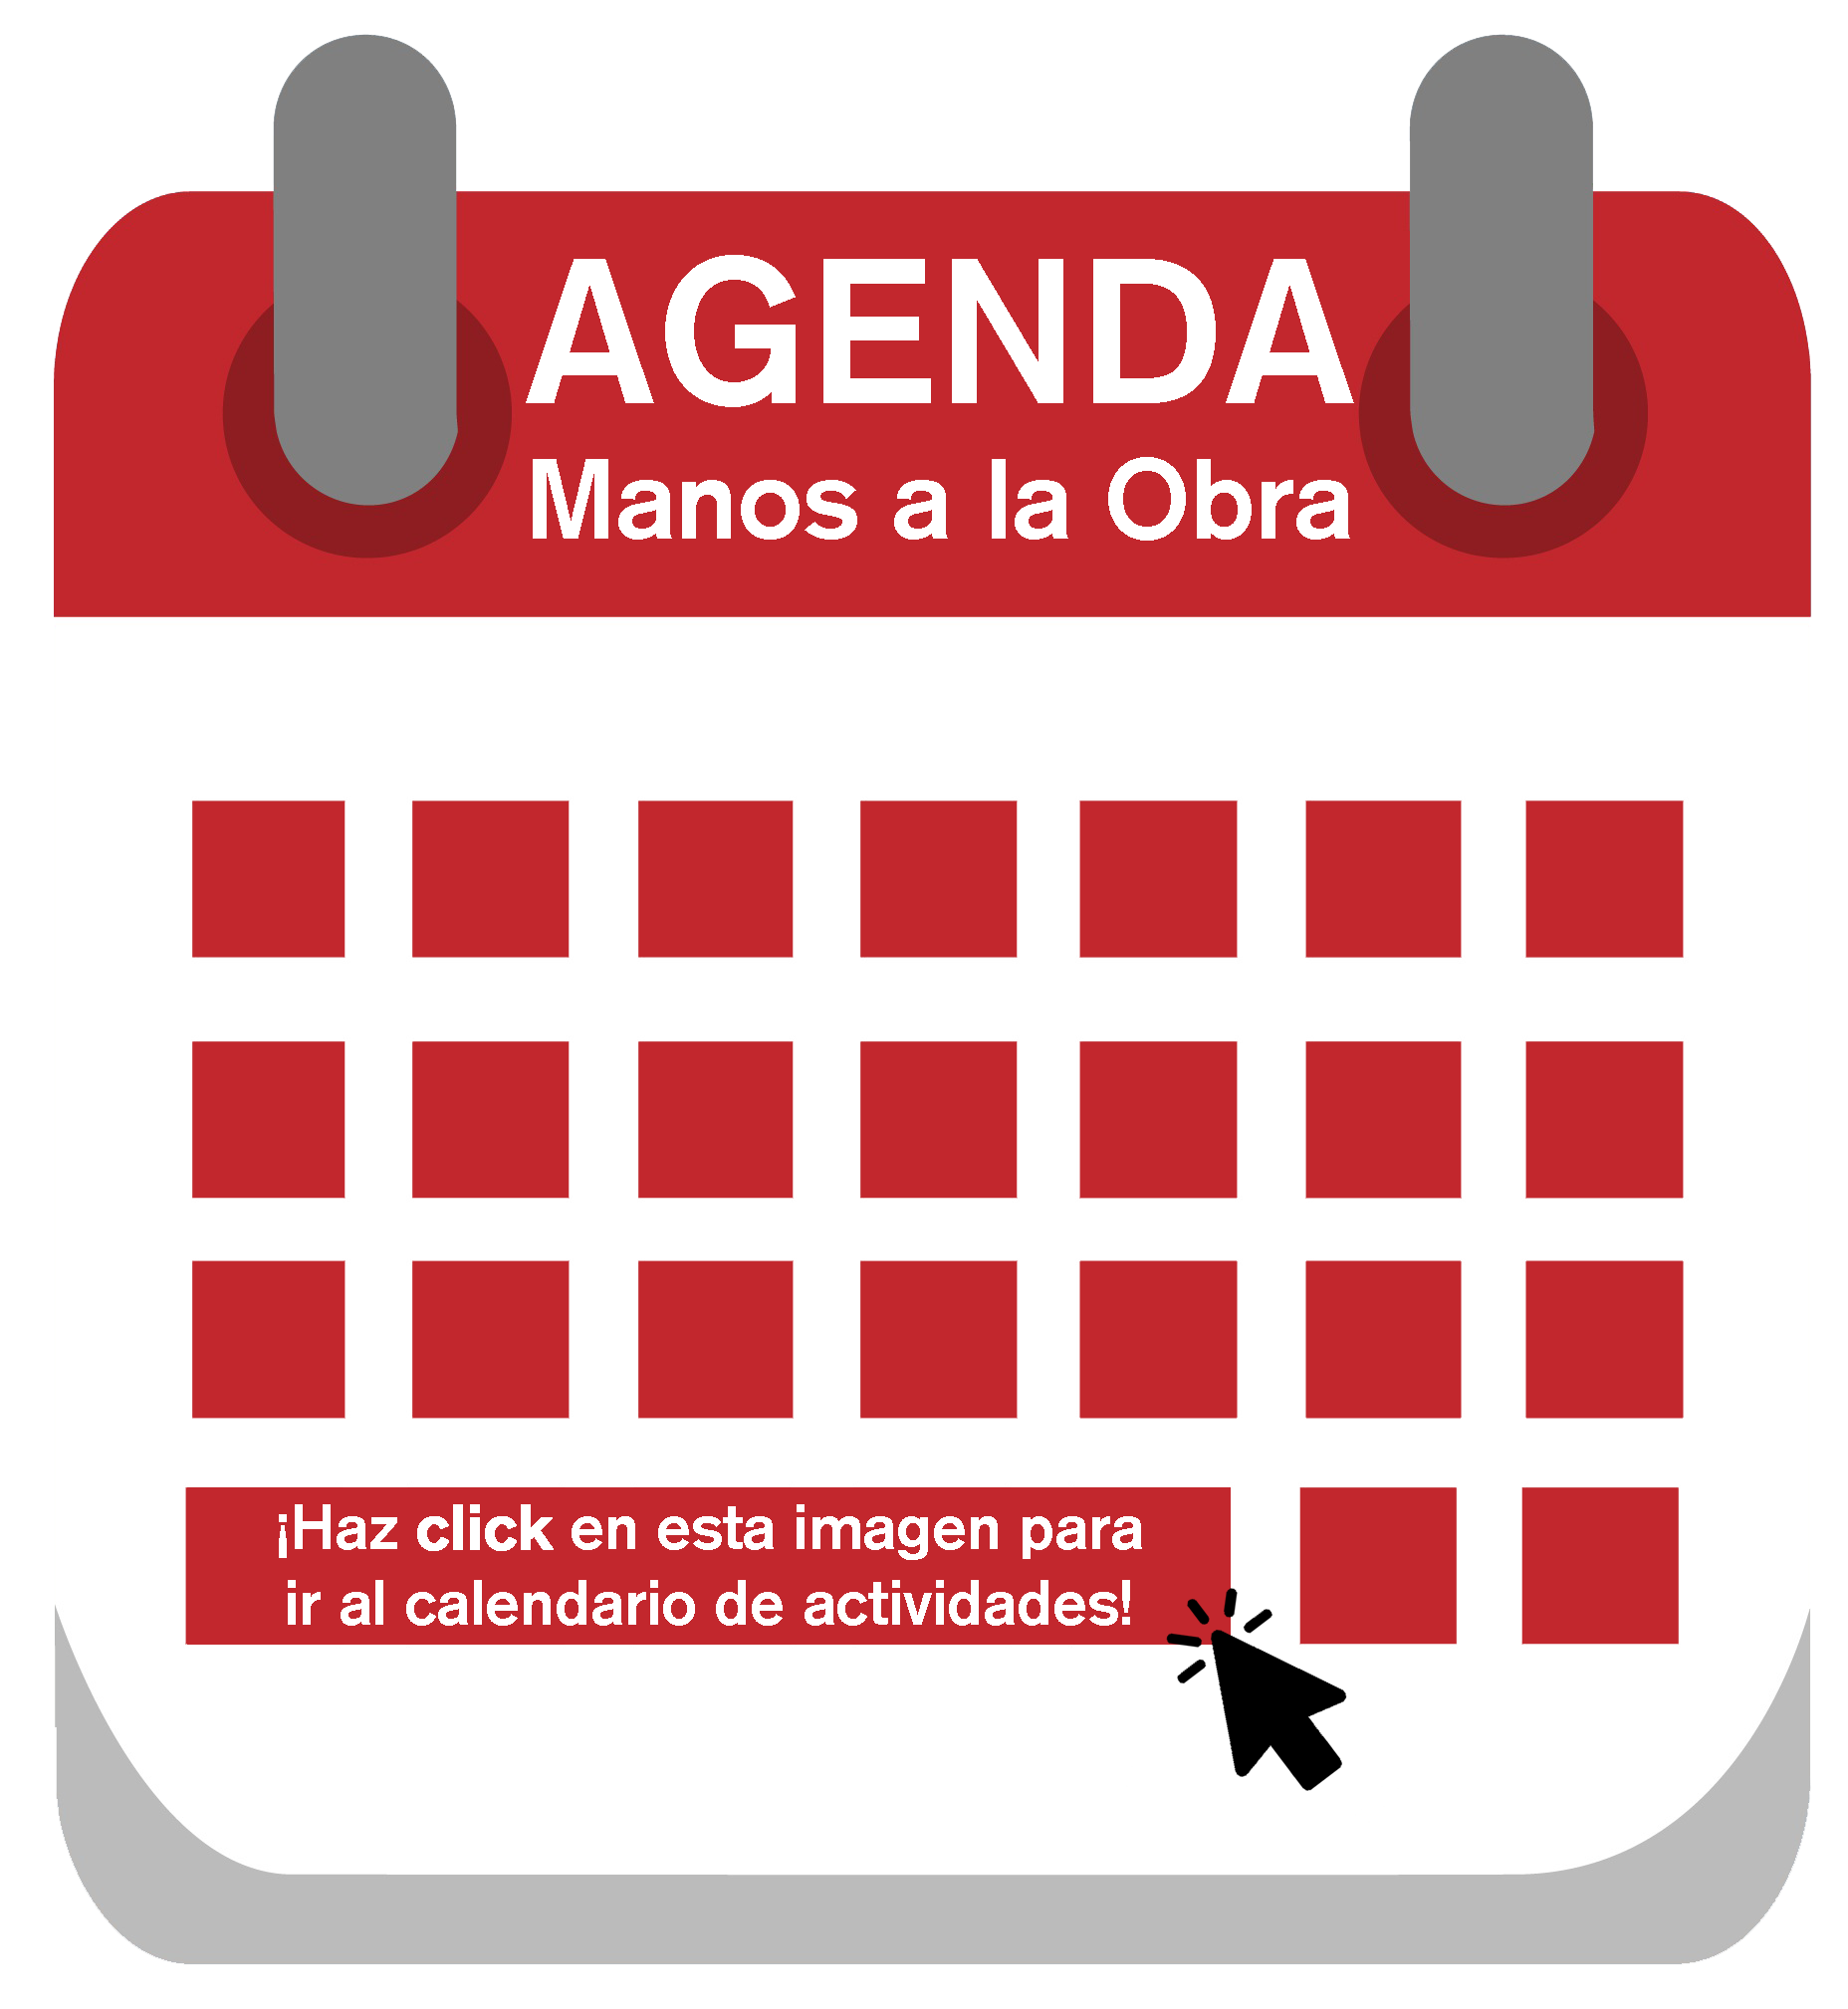 Agenda Manos a la obra